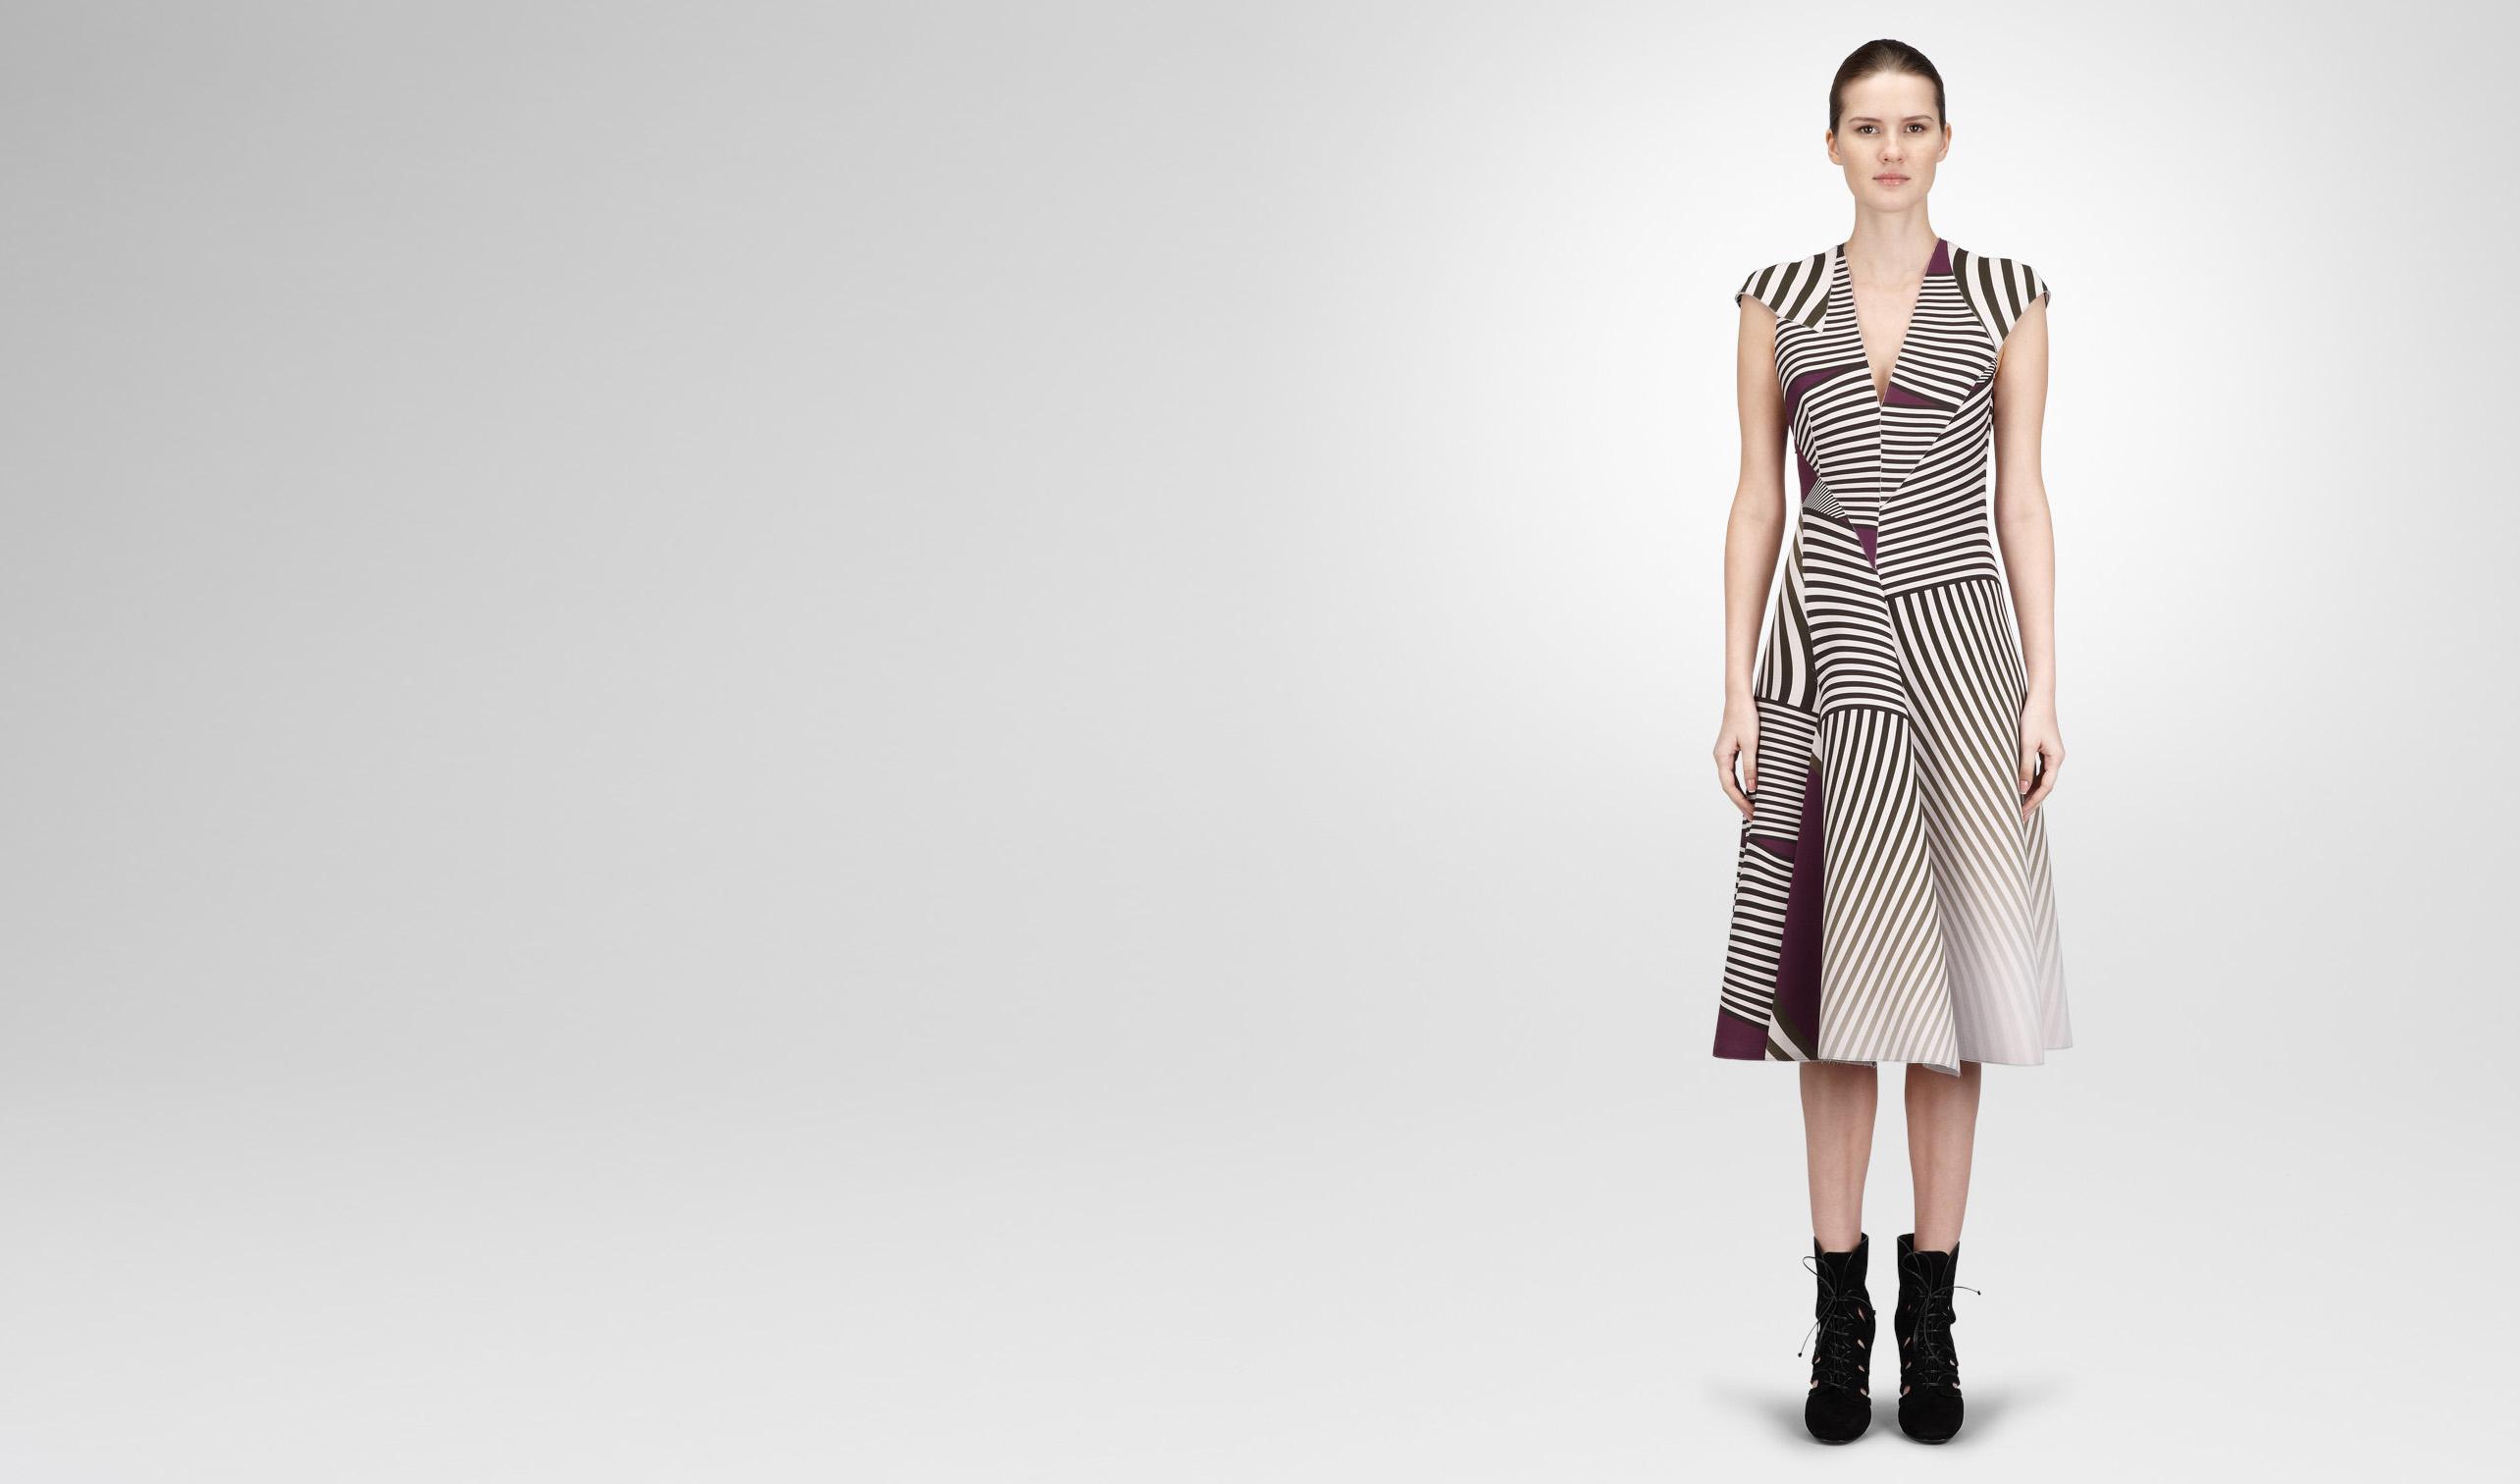 BOTTEGA VENETA Dress D DARK MIST NERO MONALISA OPTICAL PRINT TECHNICAL CREPE DRESS pl